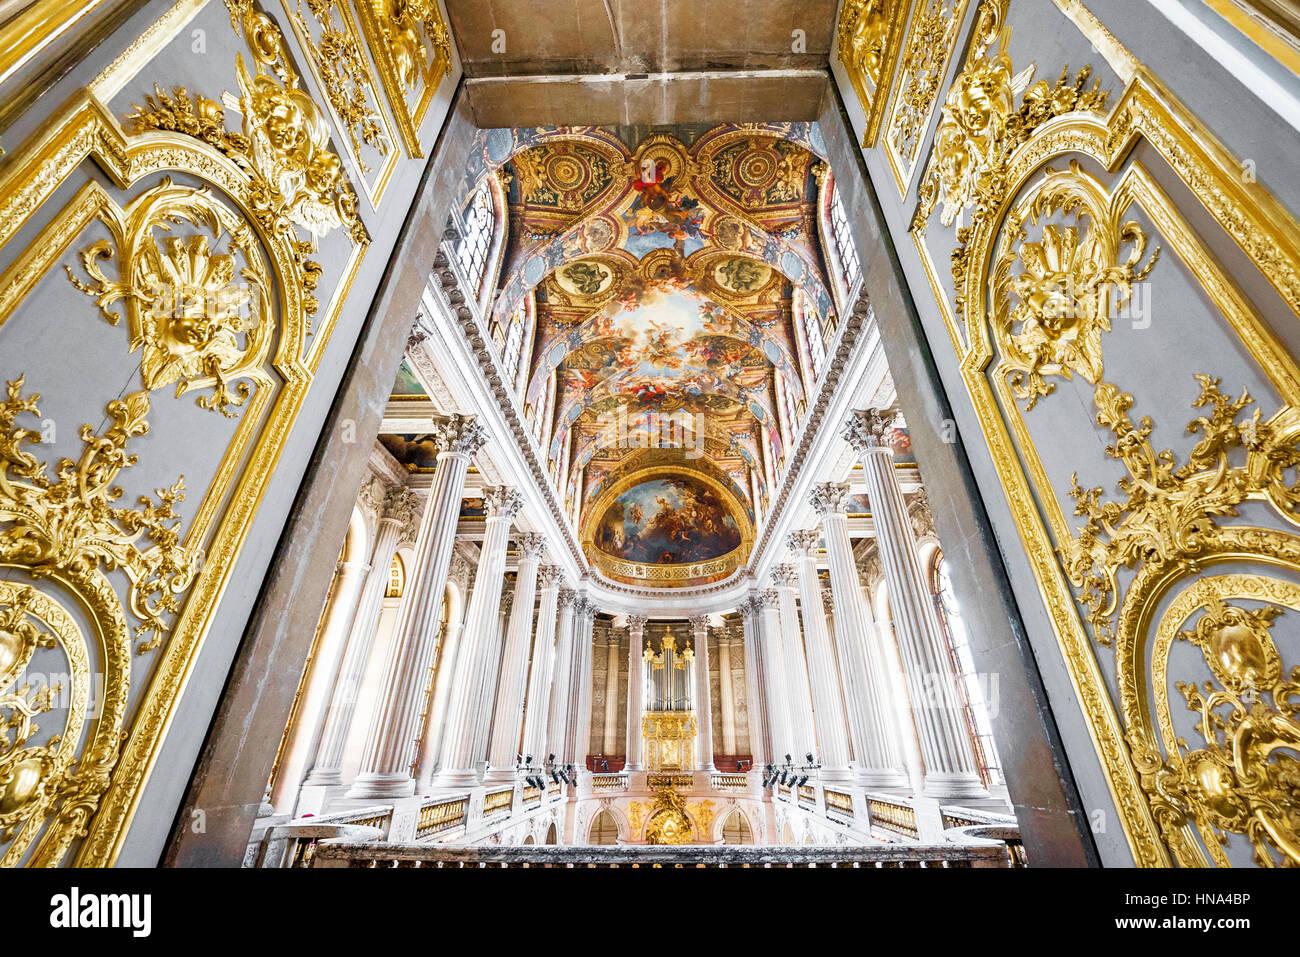 Beeindruckende Innere des Schloss Versailles Stockbild